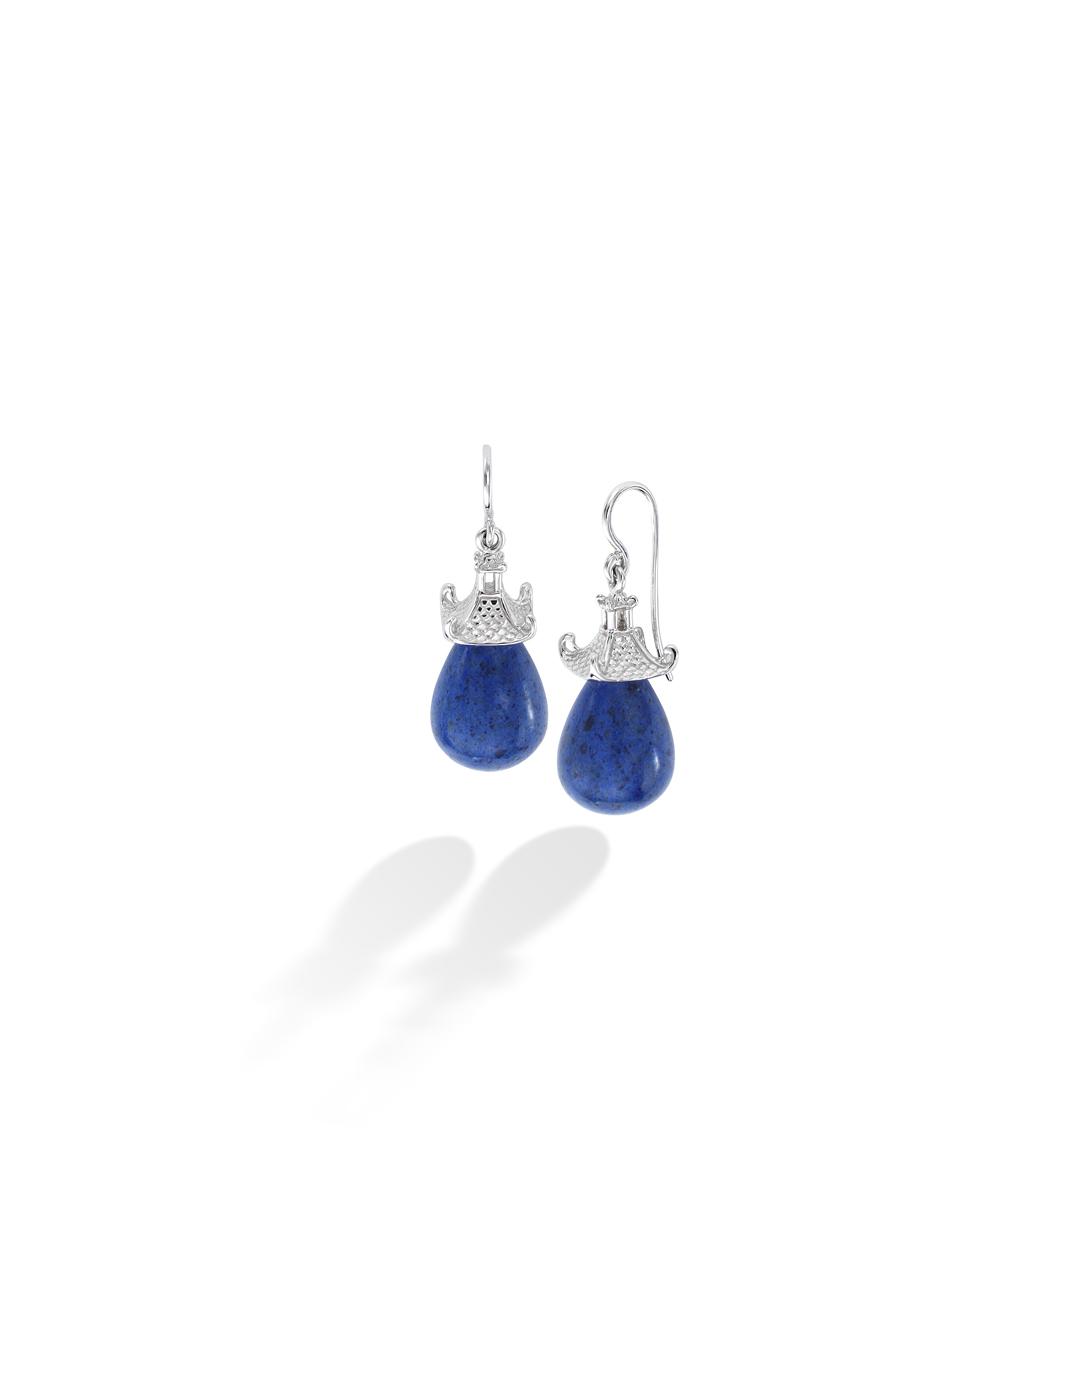 mish_products_earrings_Pagoda-Amazonite-ER-1